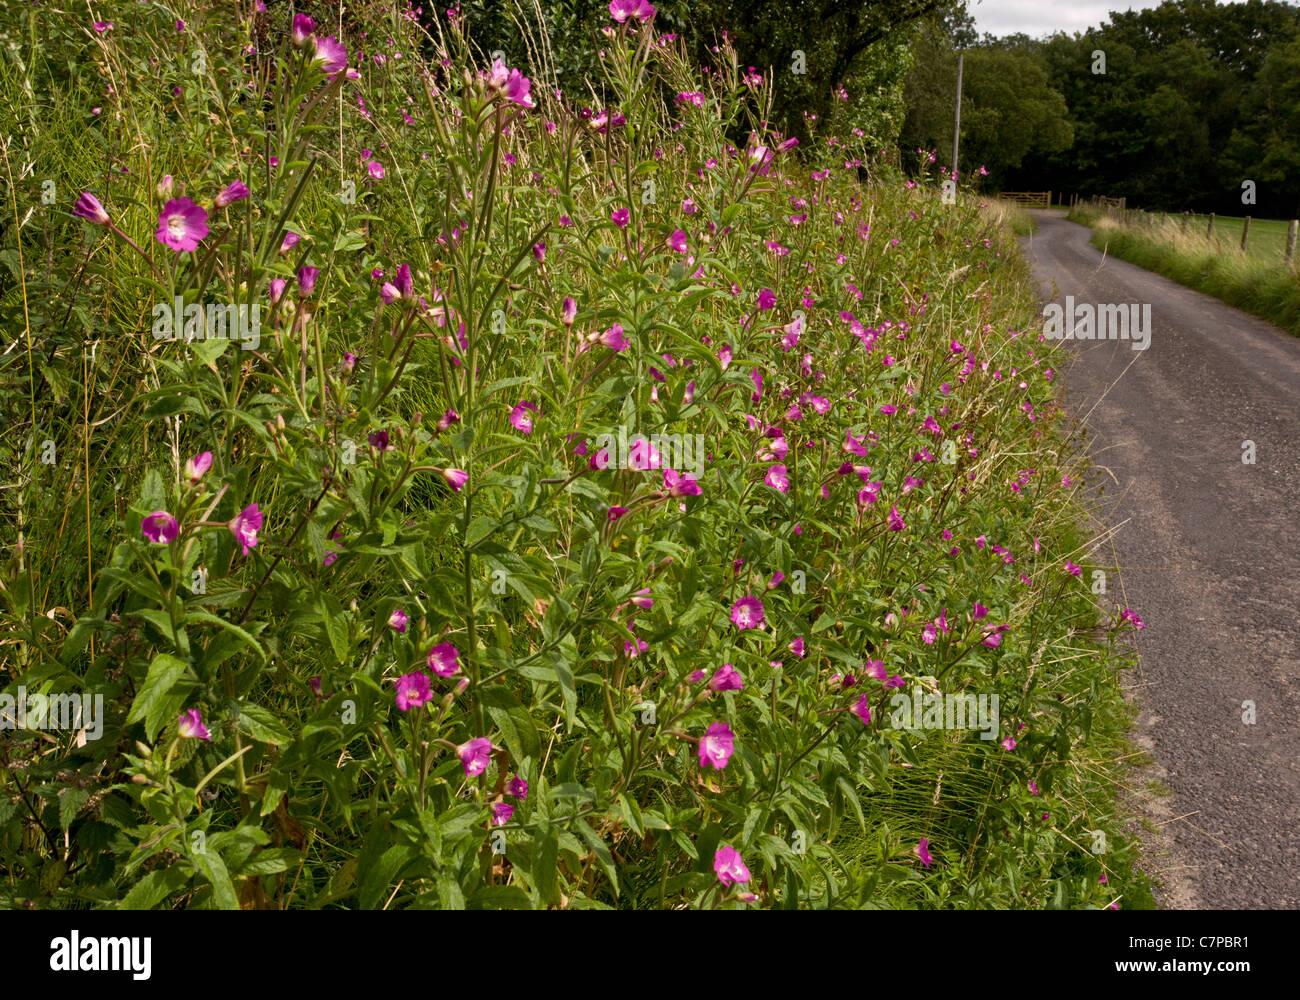 Roadside verge with Hairy Willow-herb, Epilobium hirsutum, West Dorset. - Stock Image